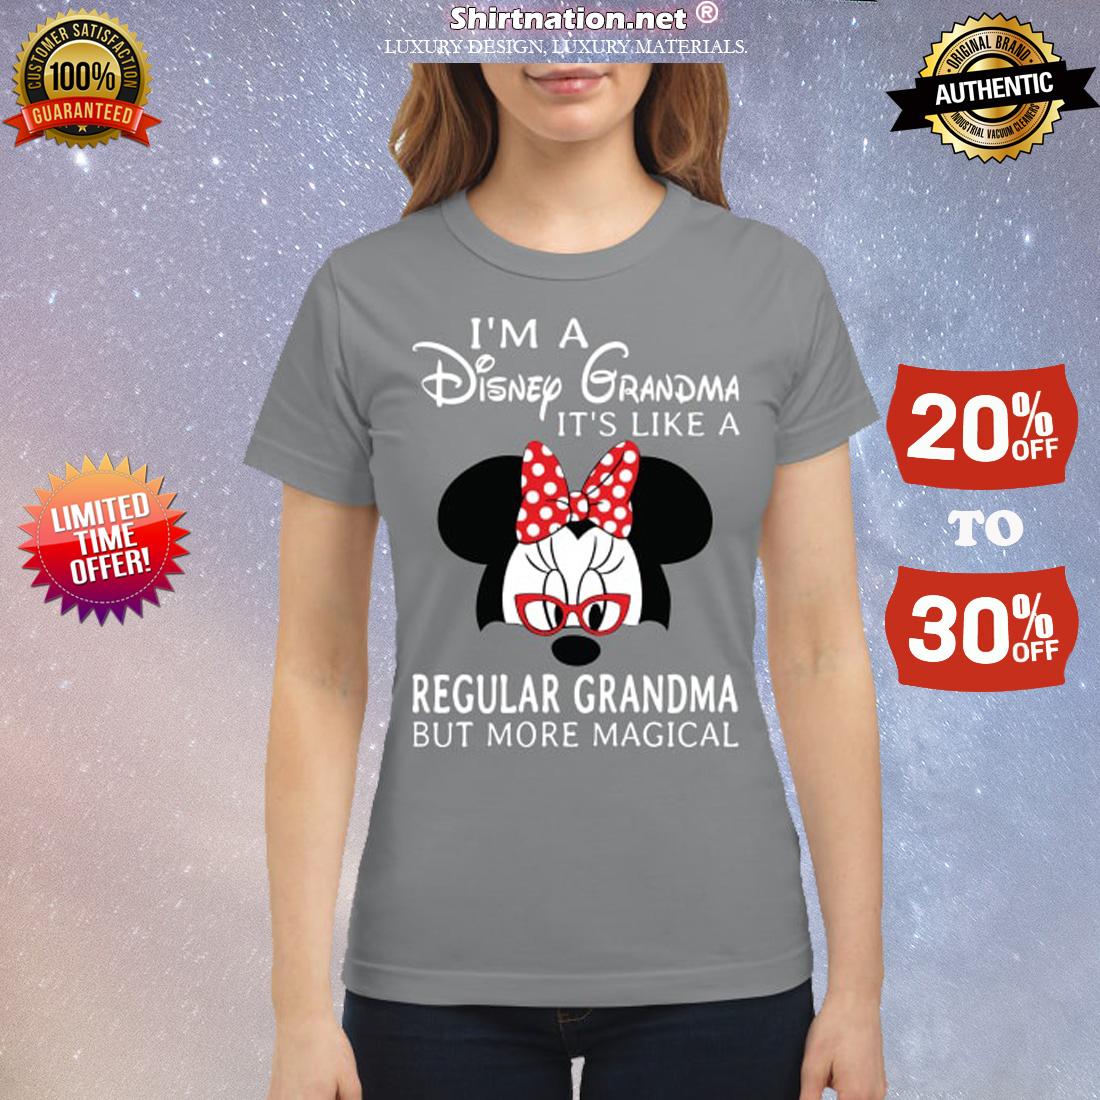 Mickey mouse I'm a Disney Grandma it's like a regular grandma but more magical classic shirt